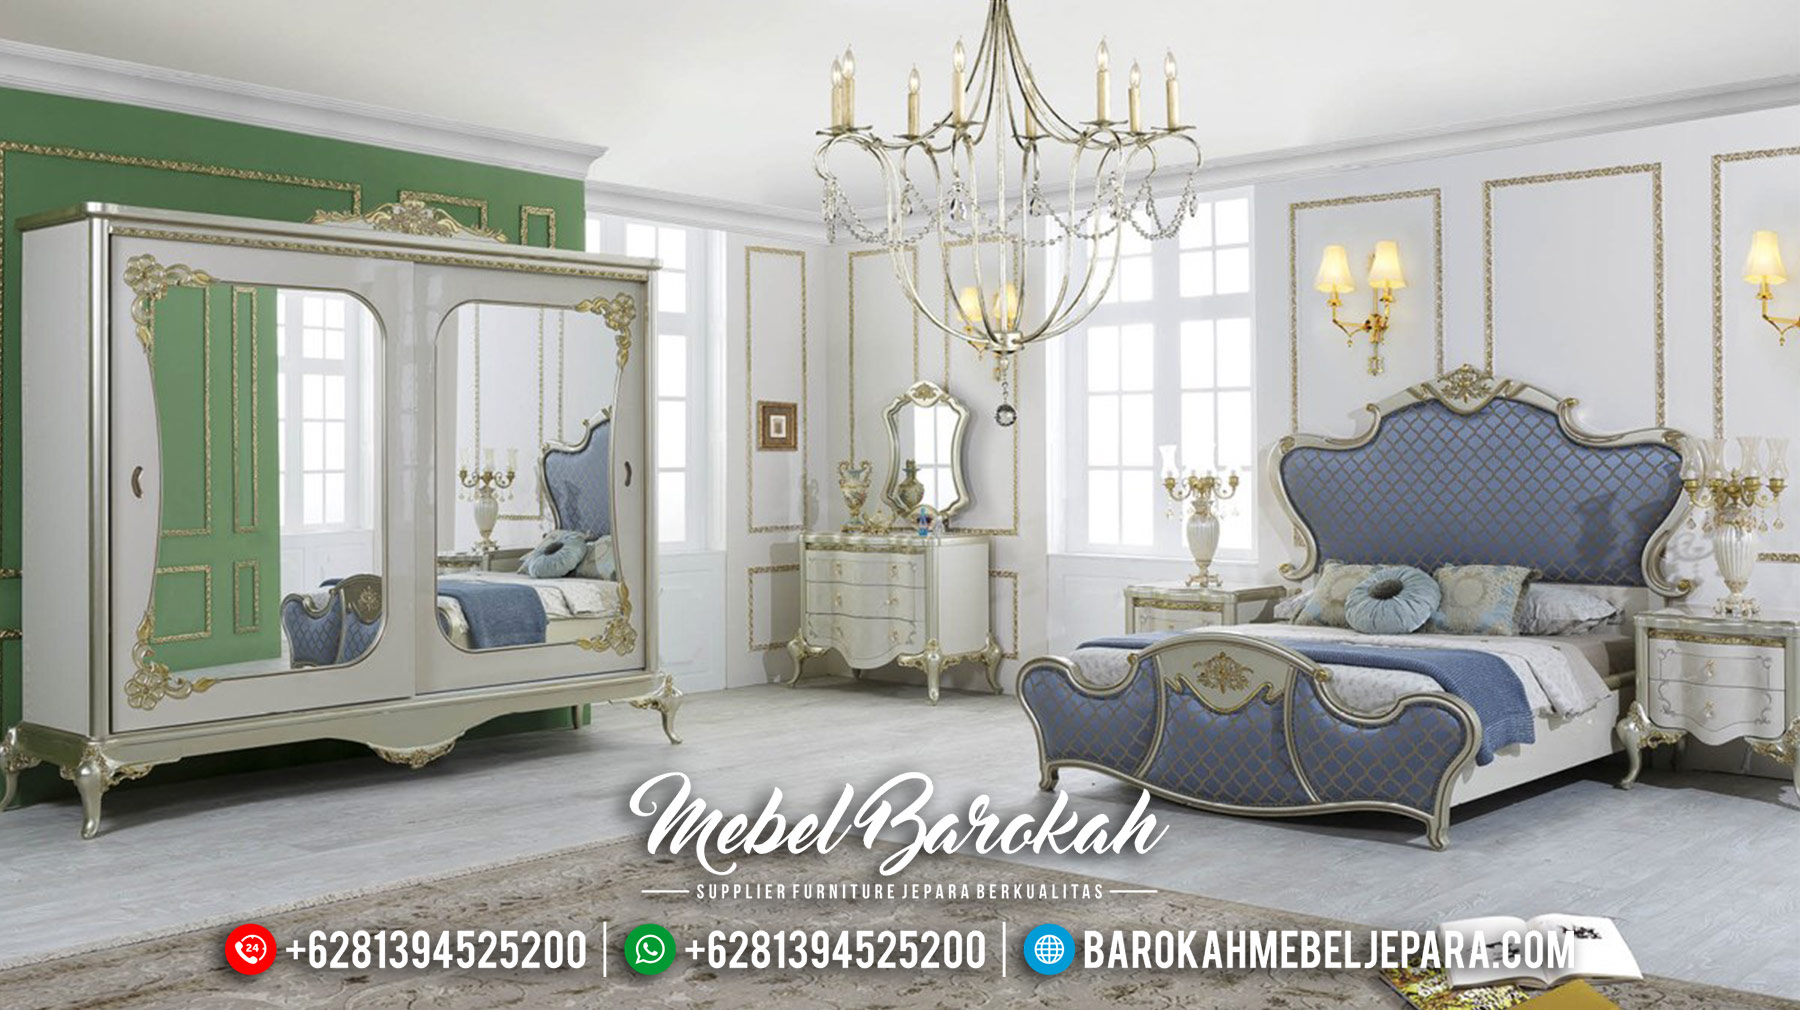 Desain Set Tempat Tidur Mewah Ukiran Luxury Jepara Pre Sale MB-0559